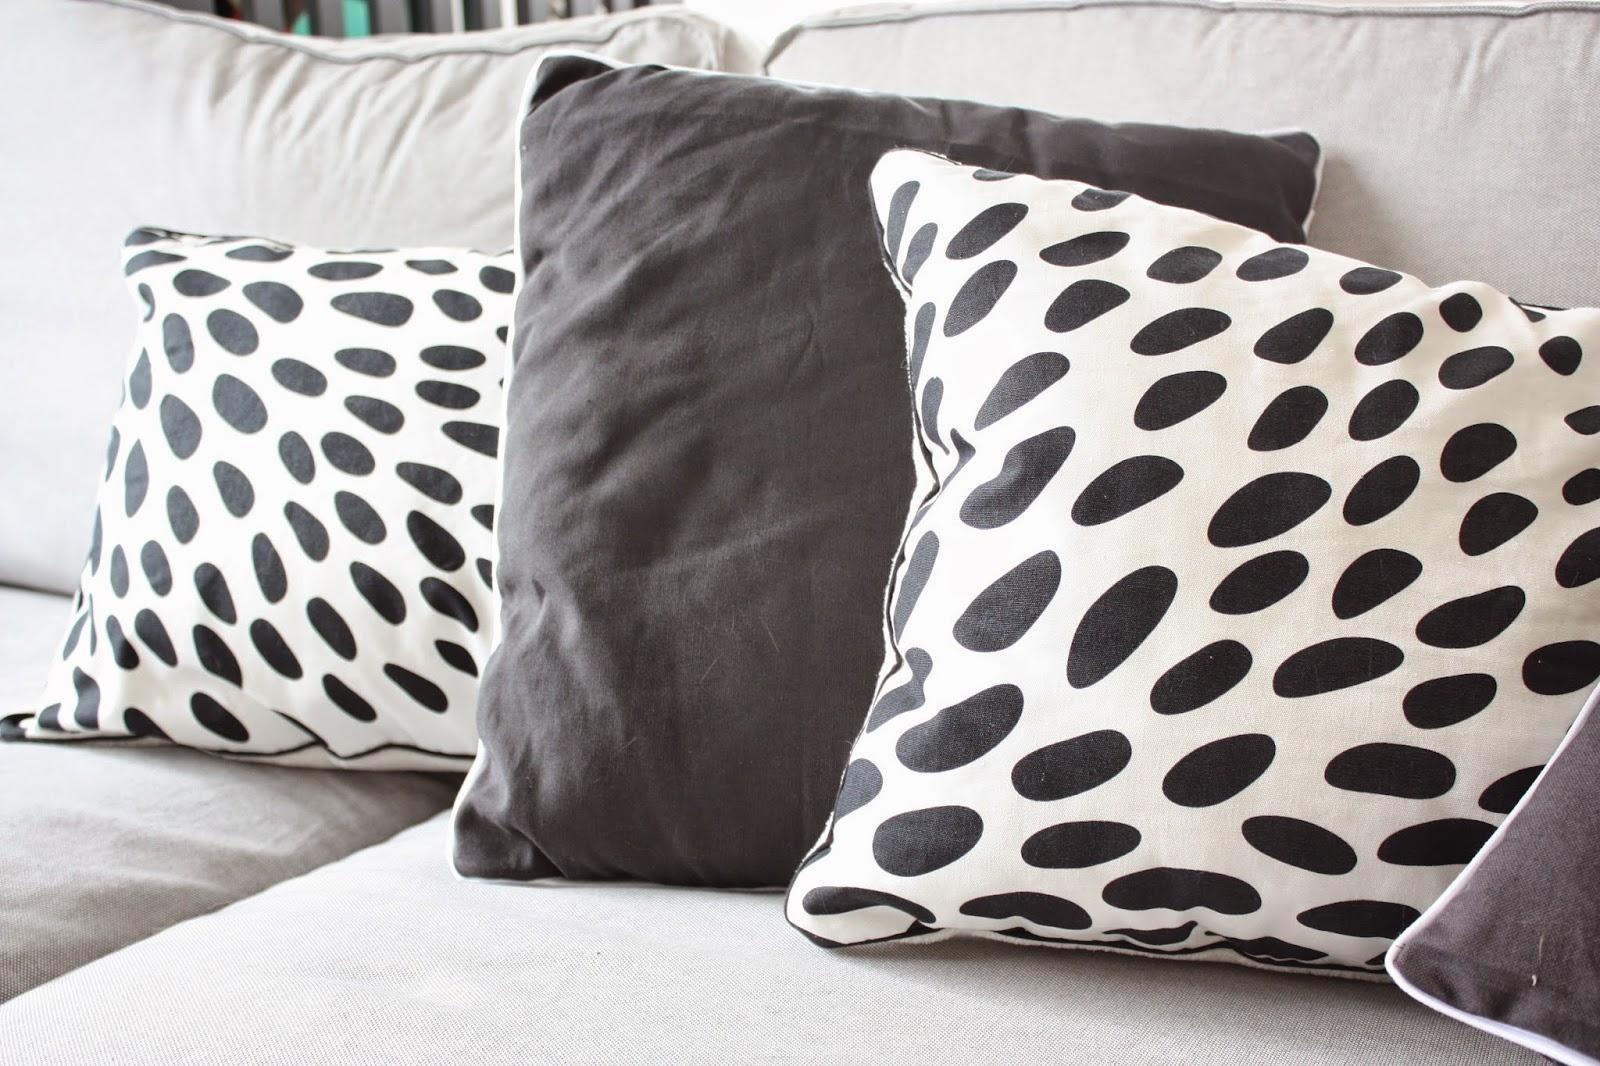 Ll handgemaakt: compromis kussens cushions